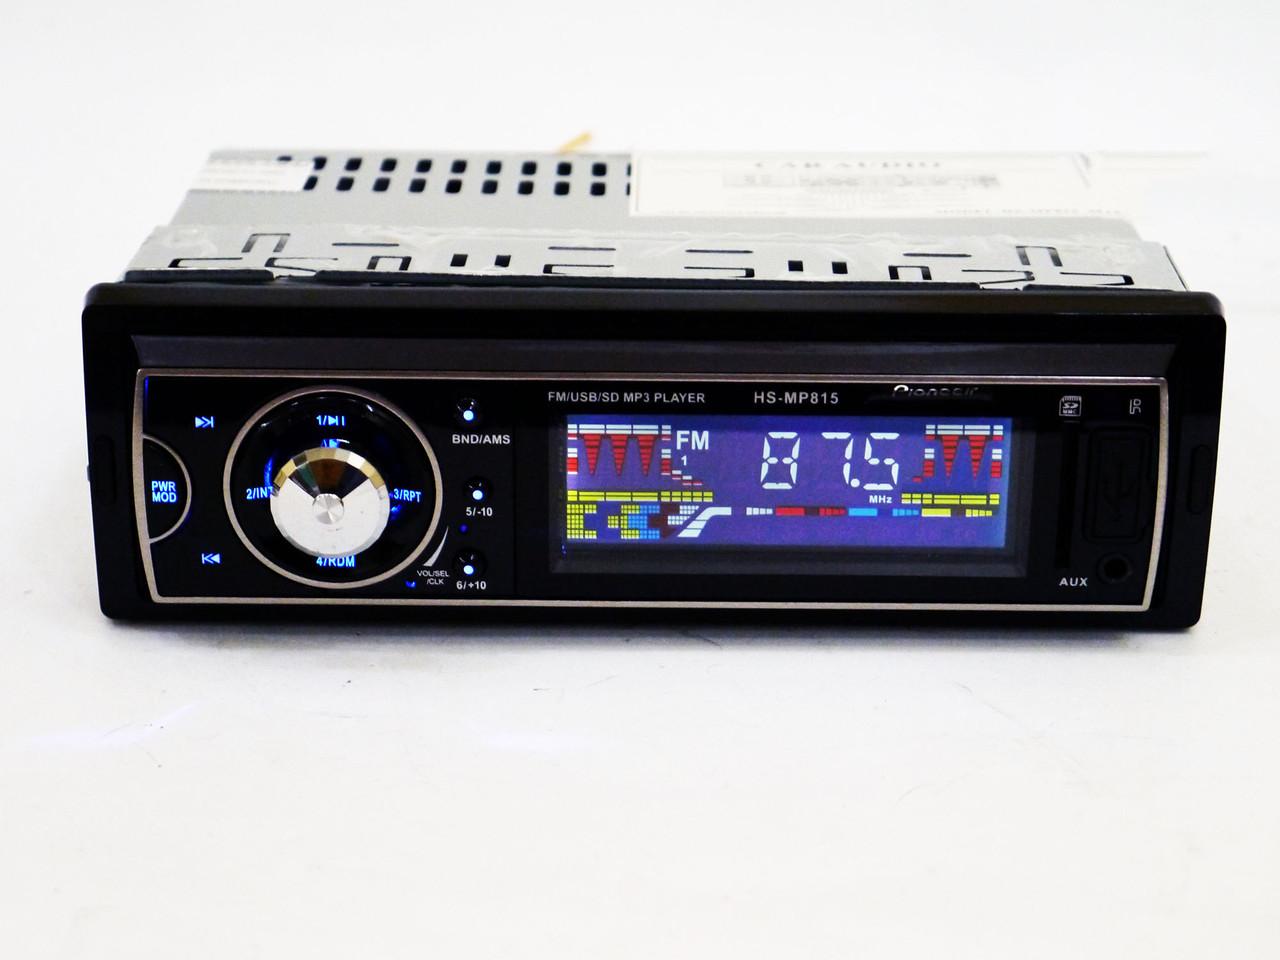 Автомагнитола Pioneer HS-MP815 - MP3 Player+F+ USB+SD+AUX